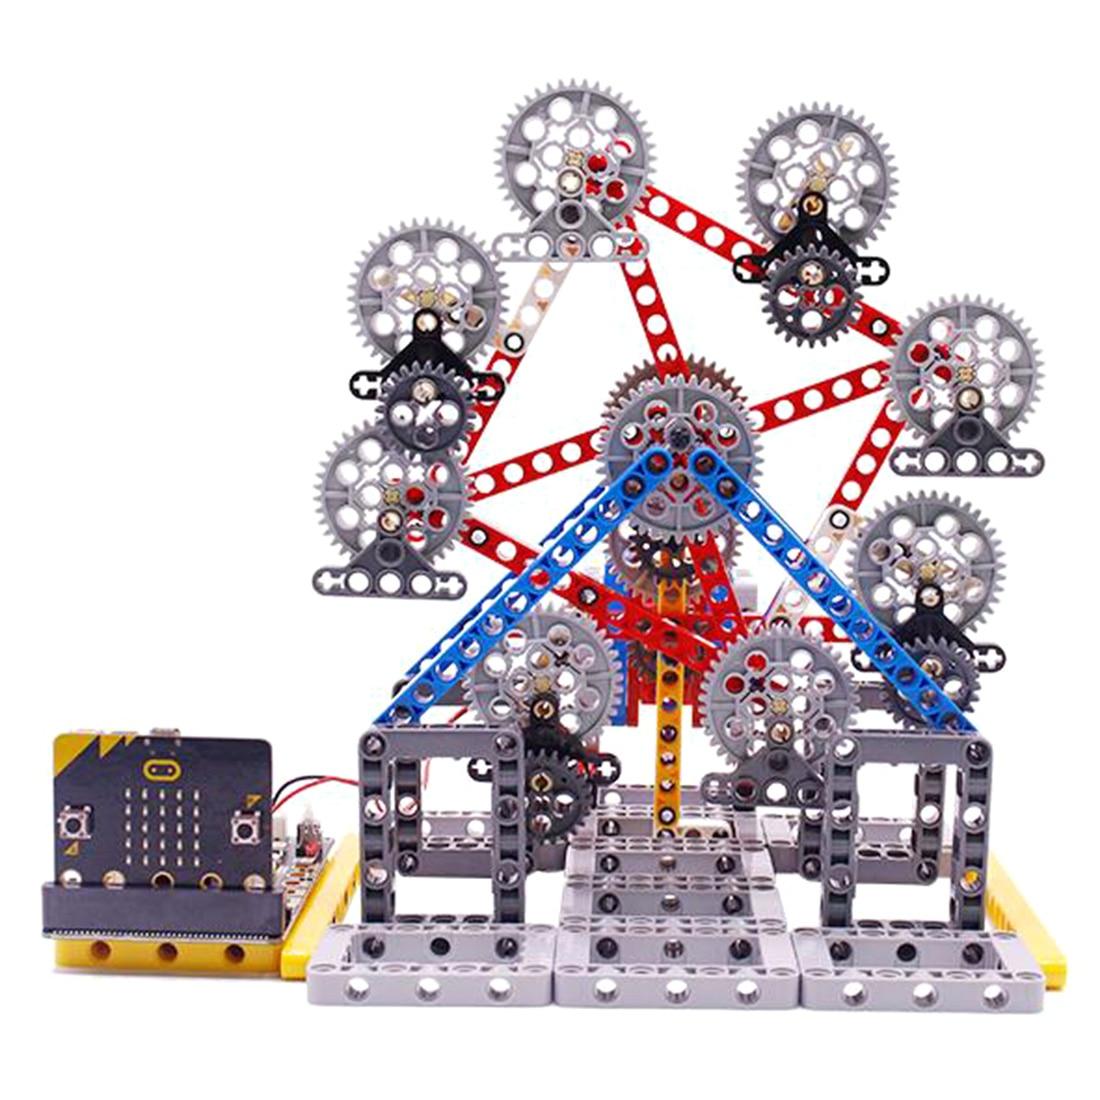 With Micro:Bit Programmable Building Block DIY Smart Ferris Wheel Kit Programable Toys For Men Kids Gift - Random Color